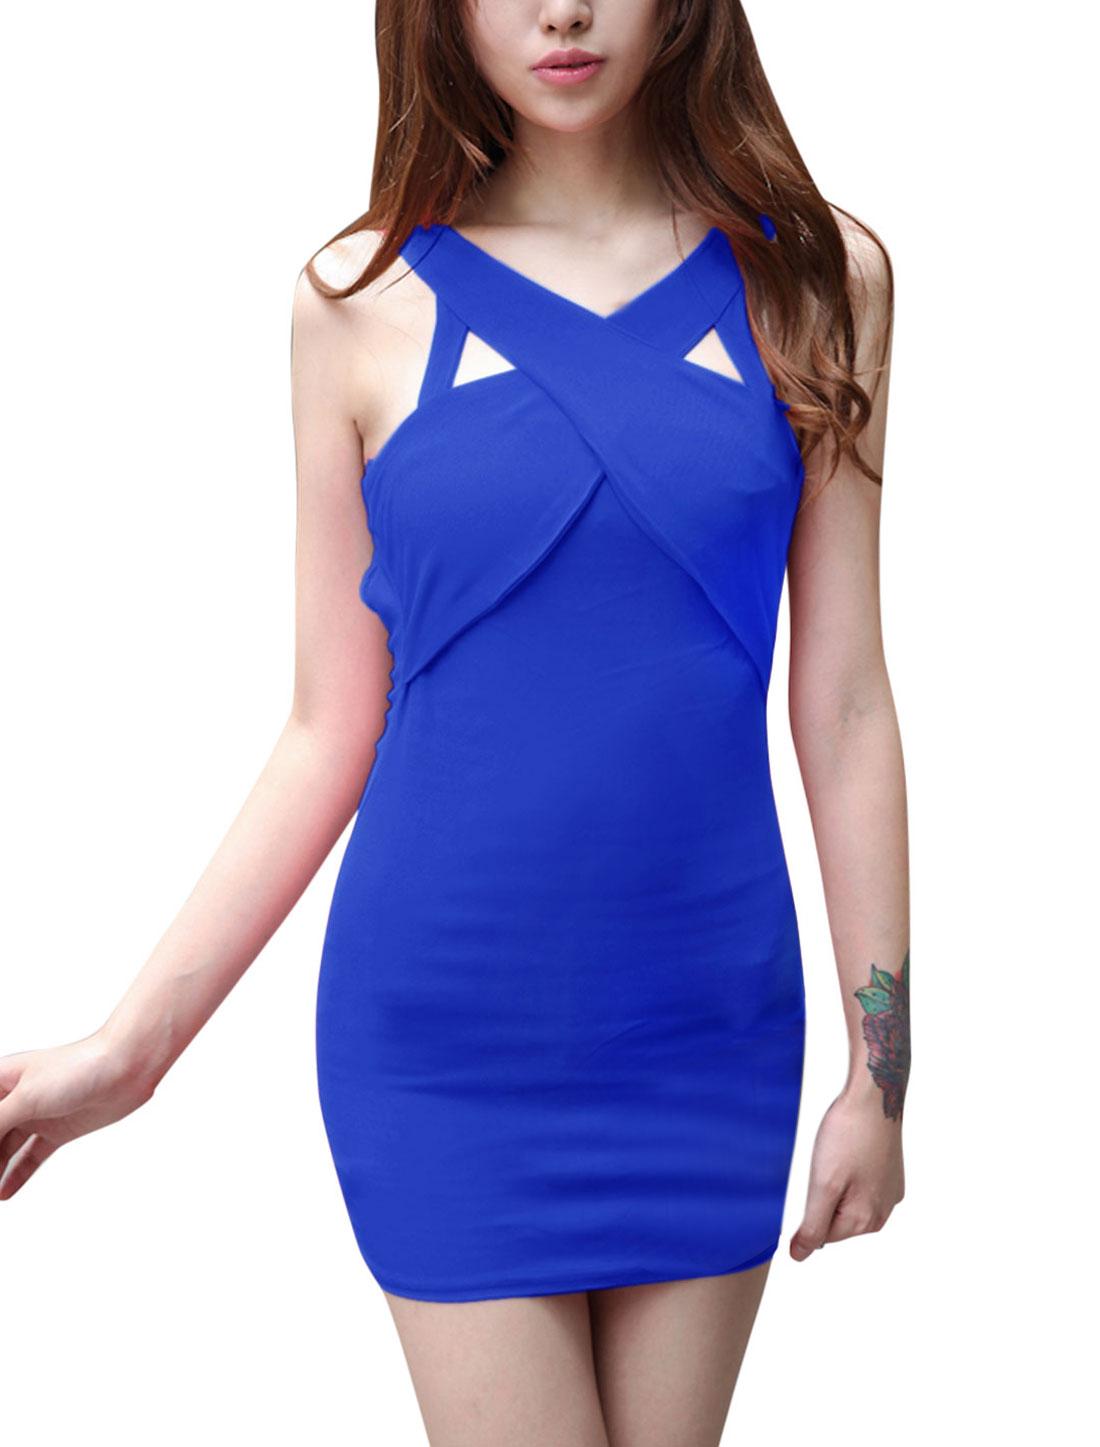 Ladies Club Wear Cut Out Detail Royal Blue Sheath Dress S